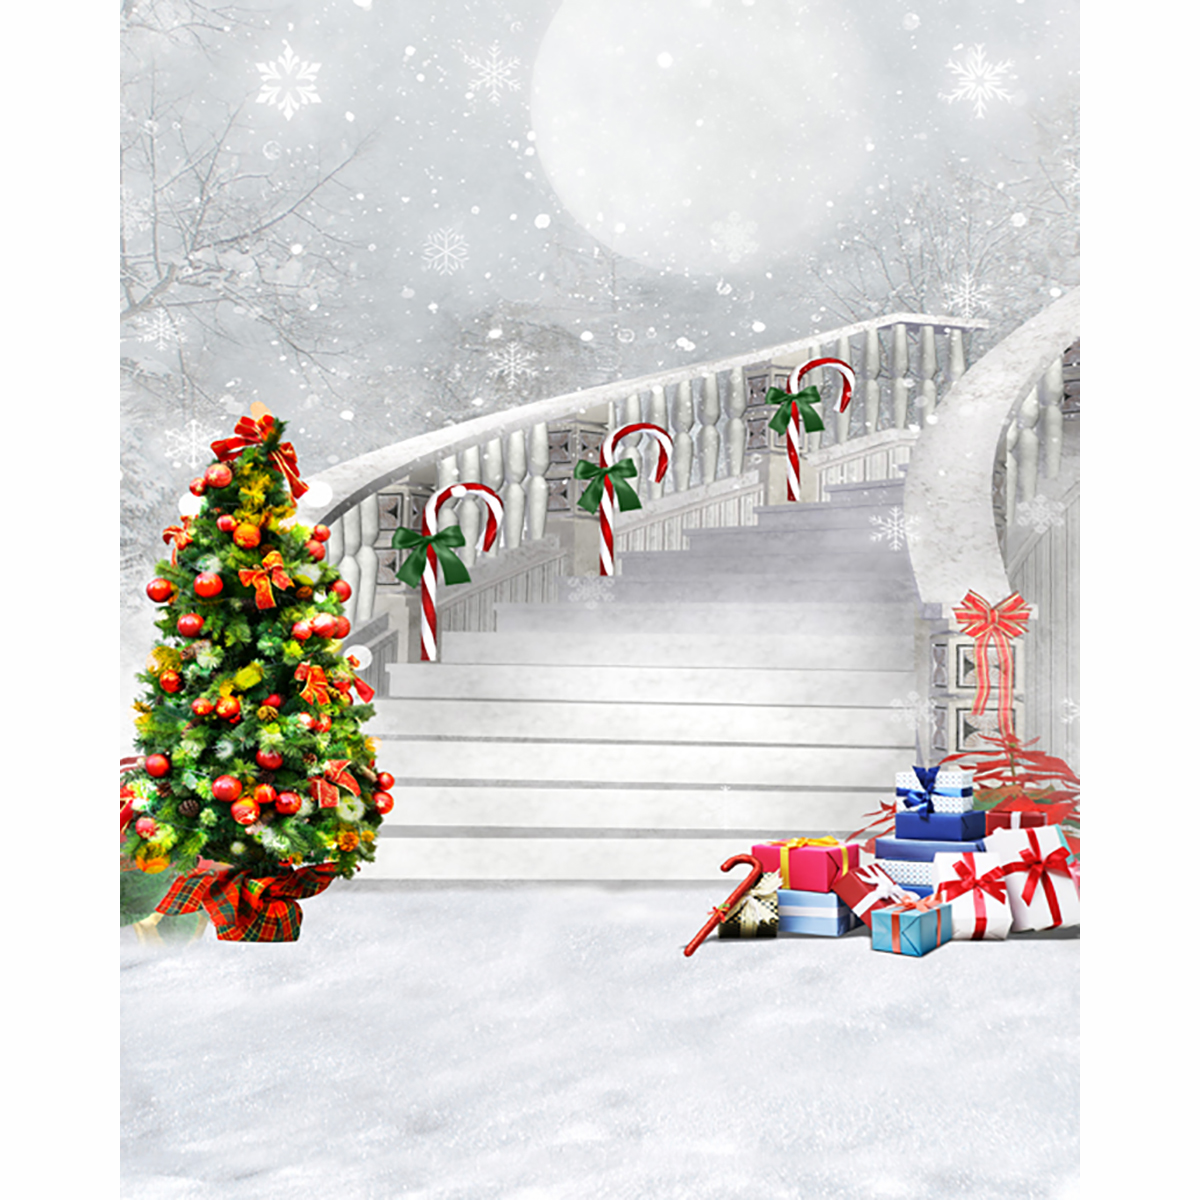 Christmas backgrounds for christmas photo studio Tree Gift Scepter ...